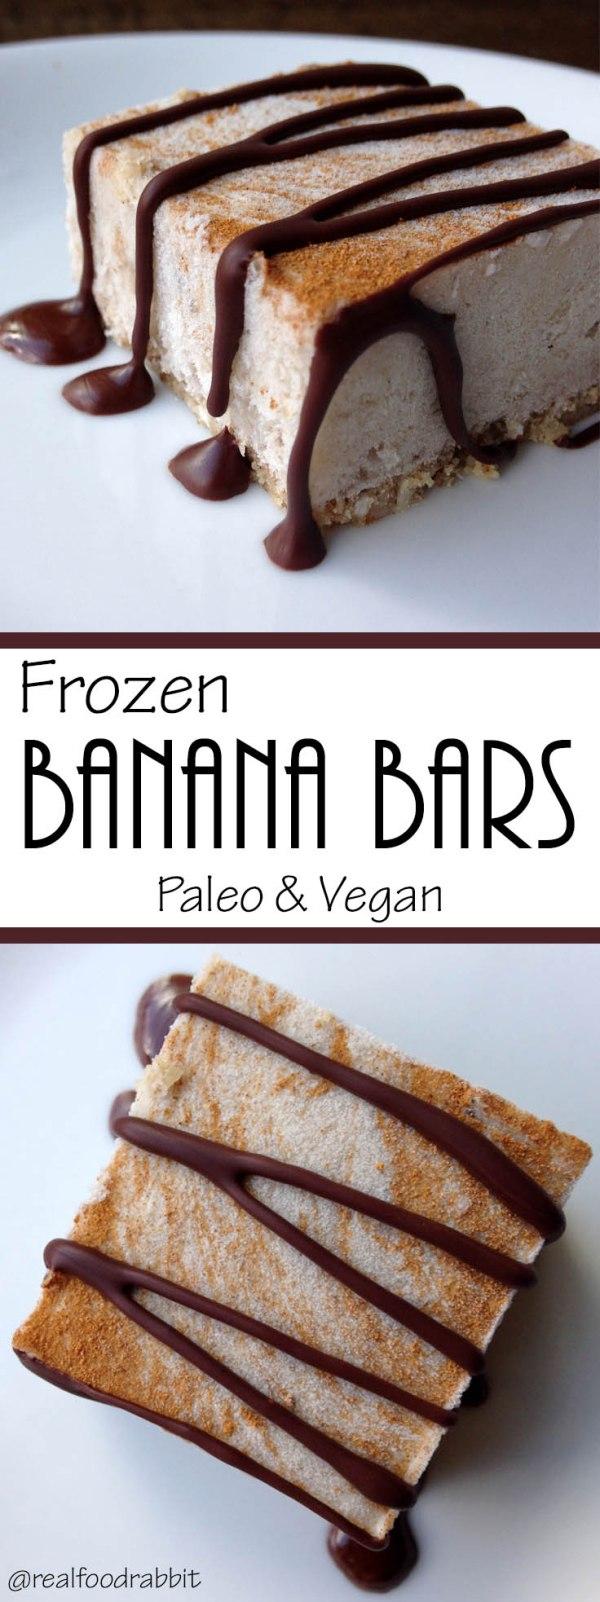 banana bars.jpg